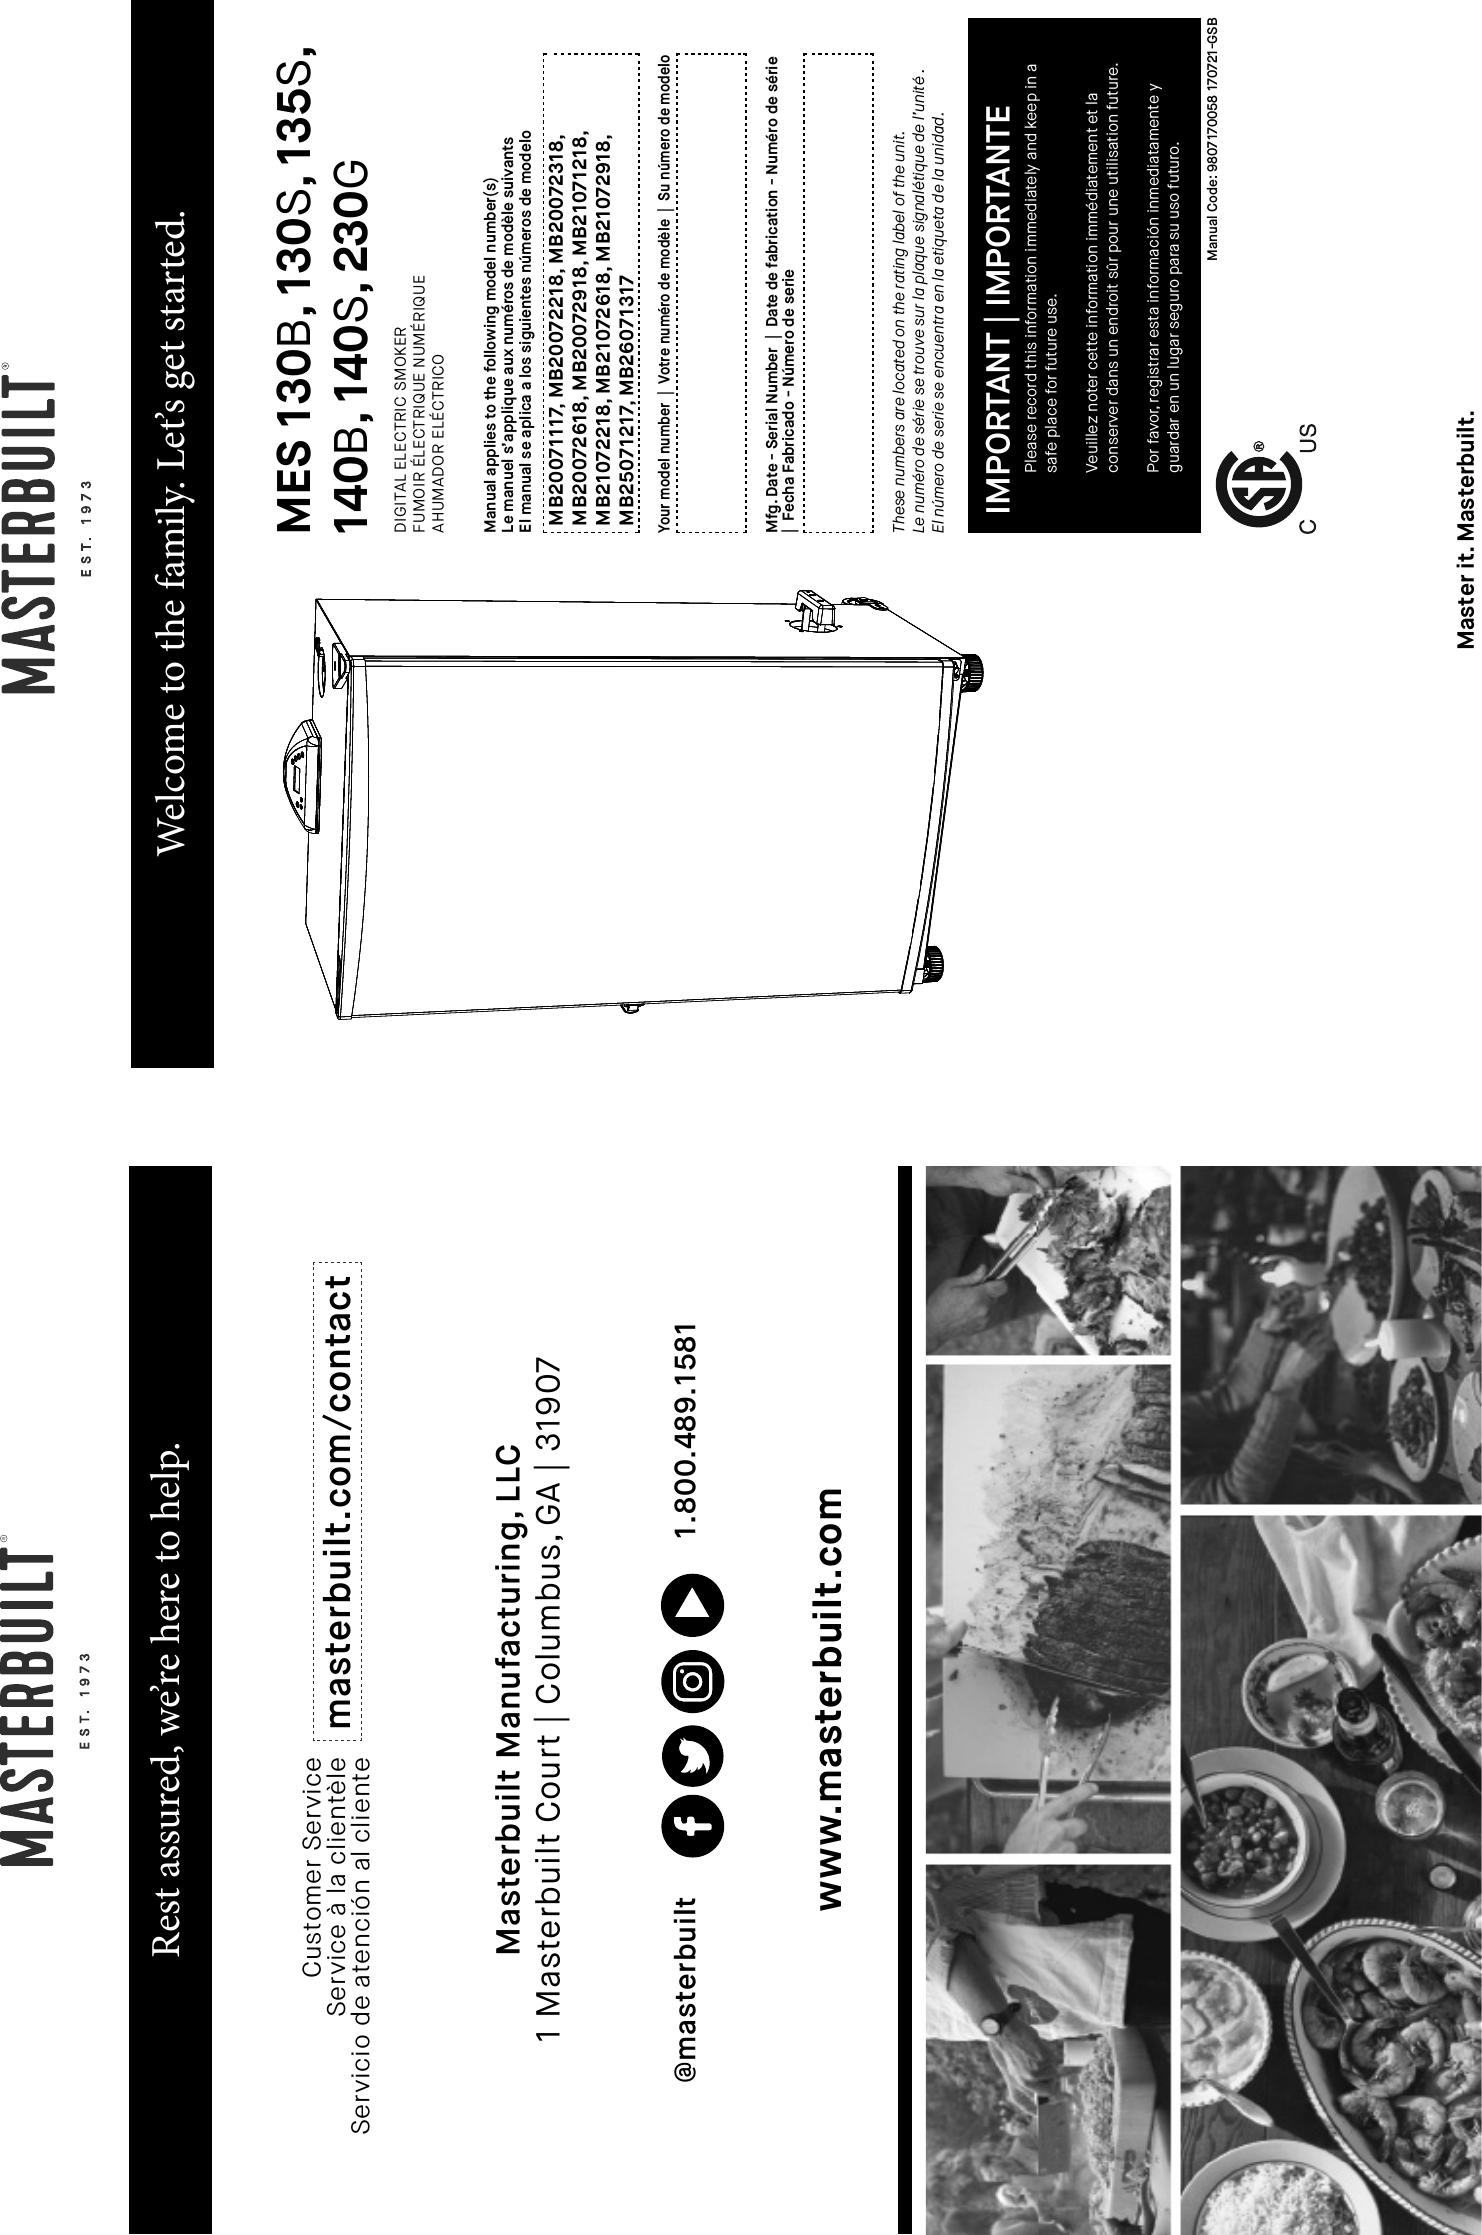 masterbuilt 40 electric smoker manual